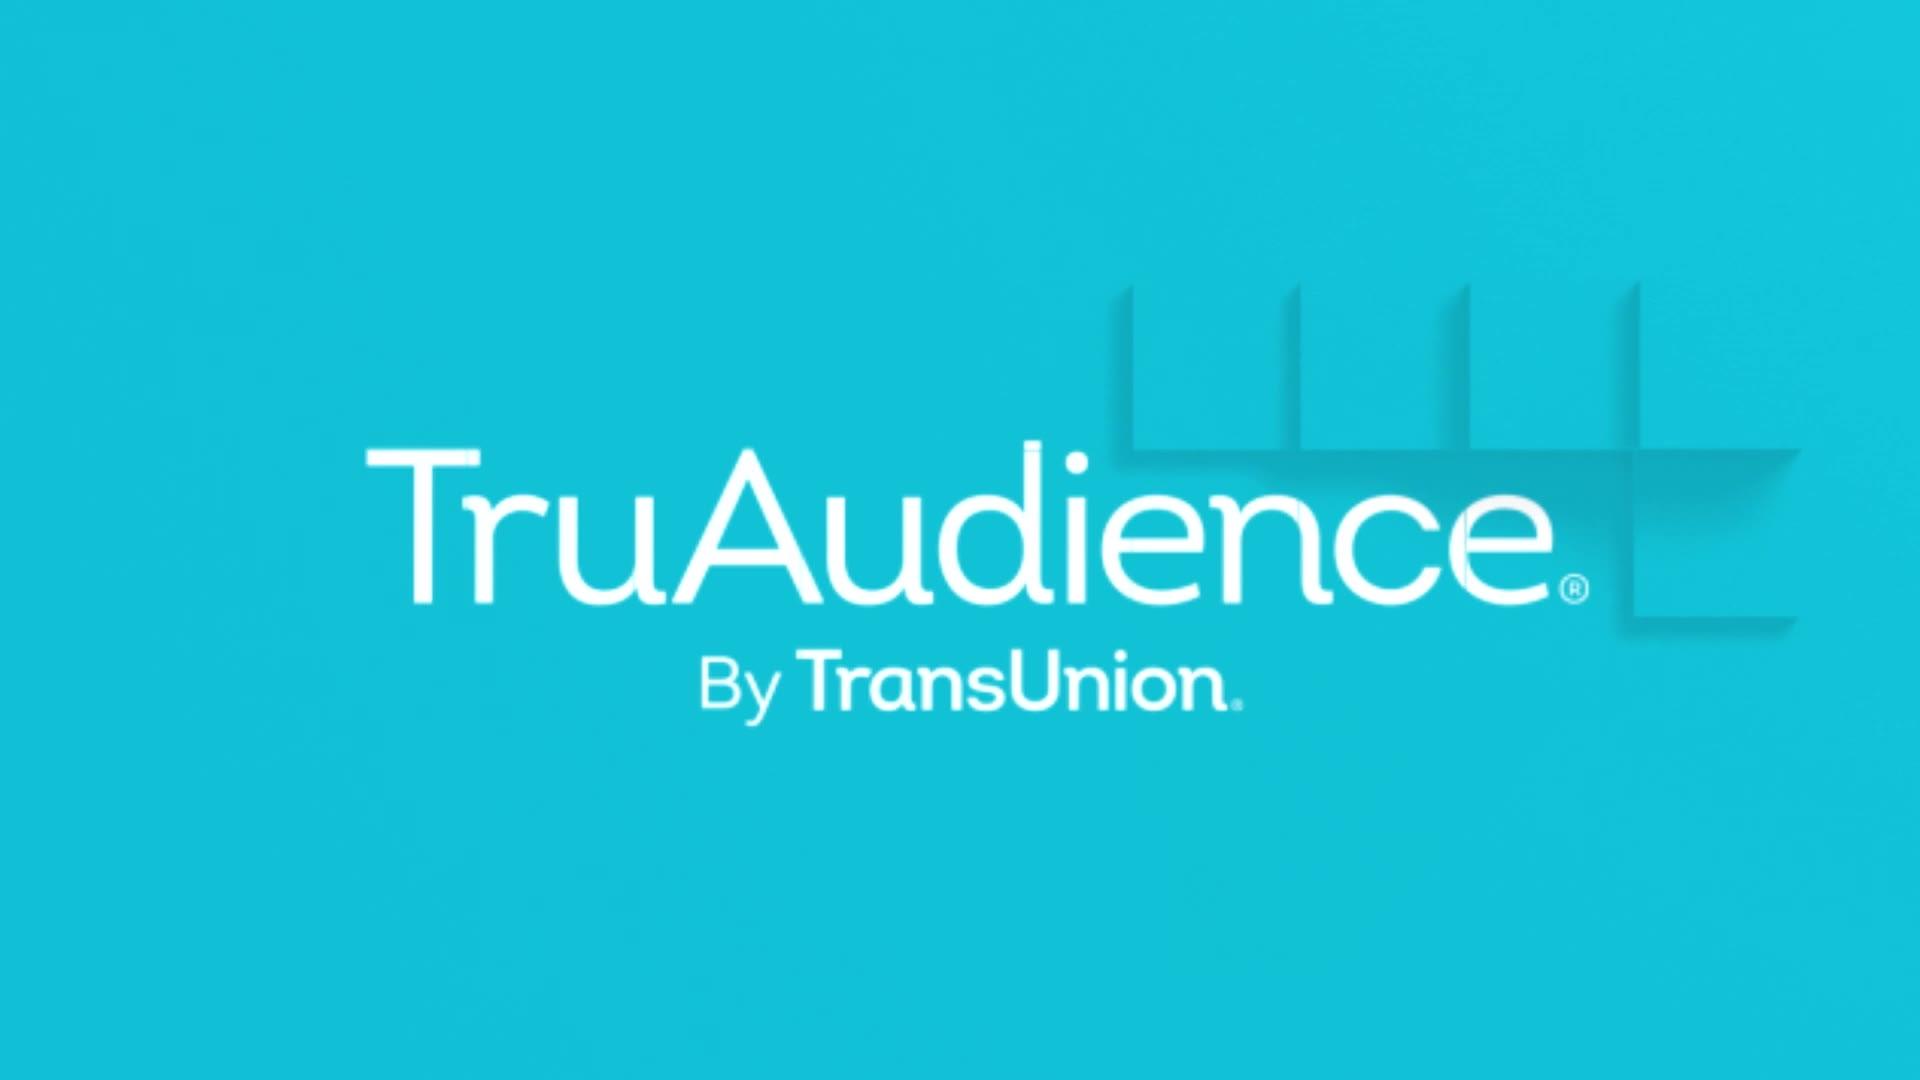 TransUnion launches TruAudience | DeviceDaily.com